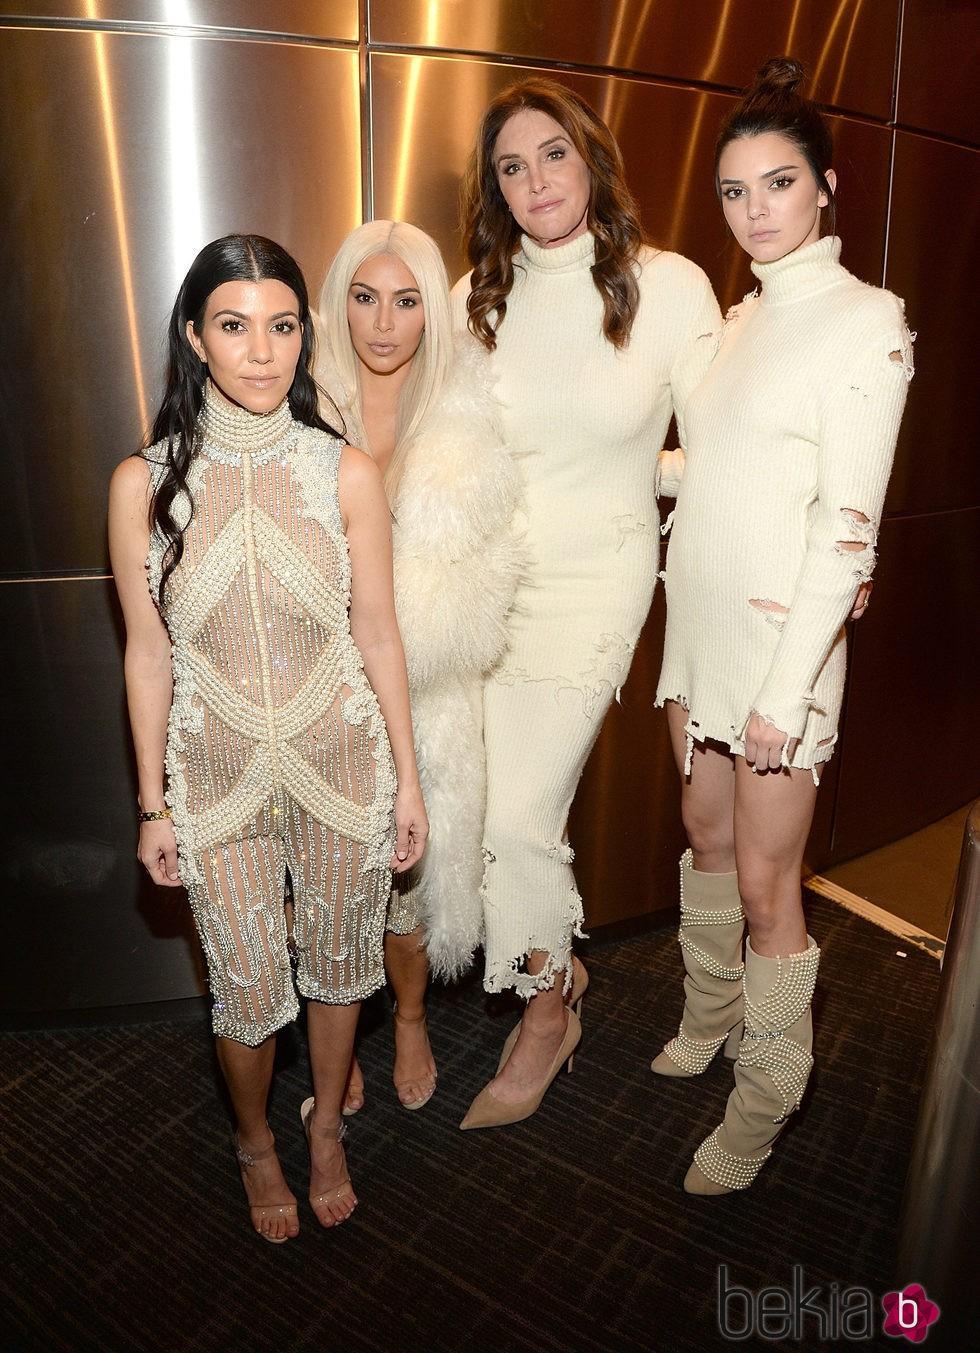 Kourtney y Kim Kardashian con Caitlyn y Kendall Jenner en el desfile de Kanye West 'Yeezy Season 3'